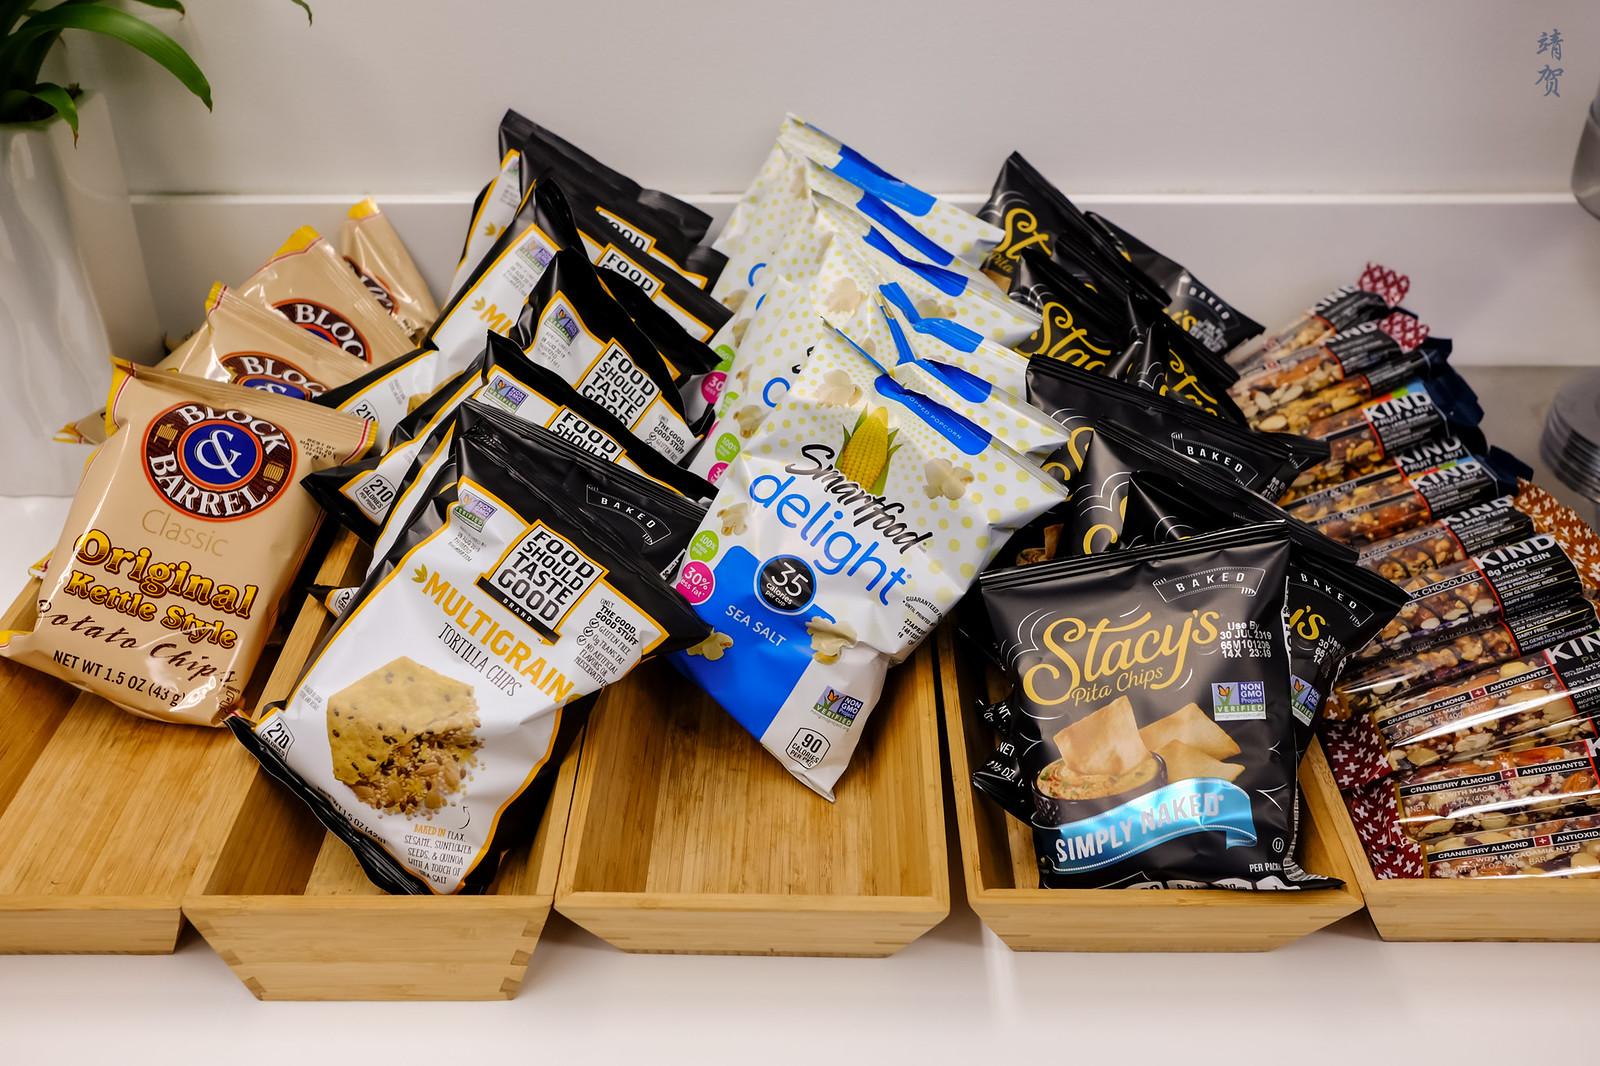 Chips and granola bars